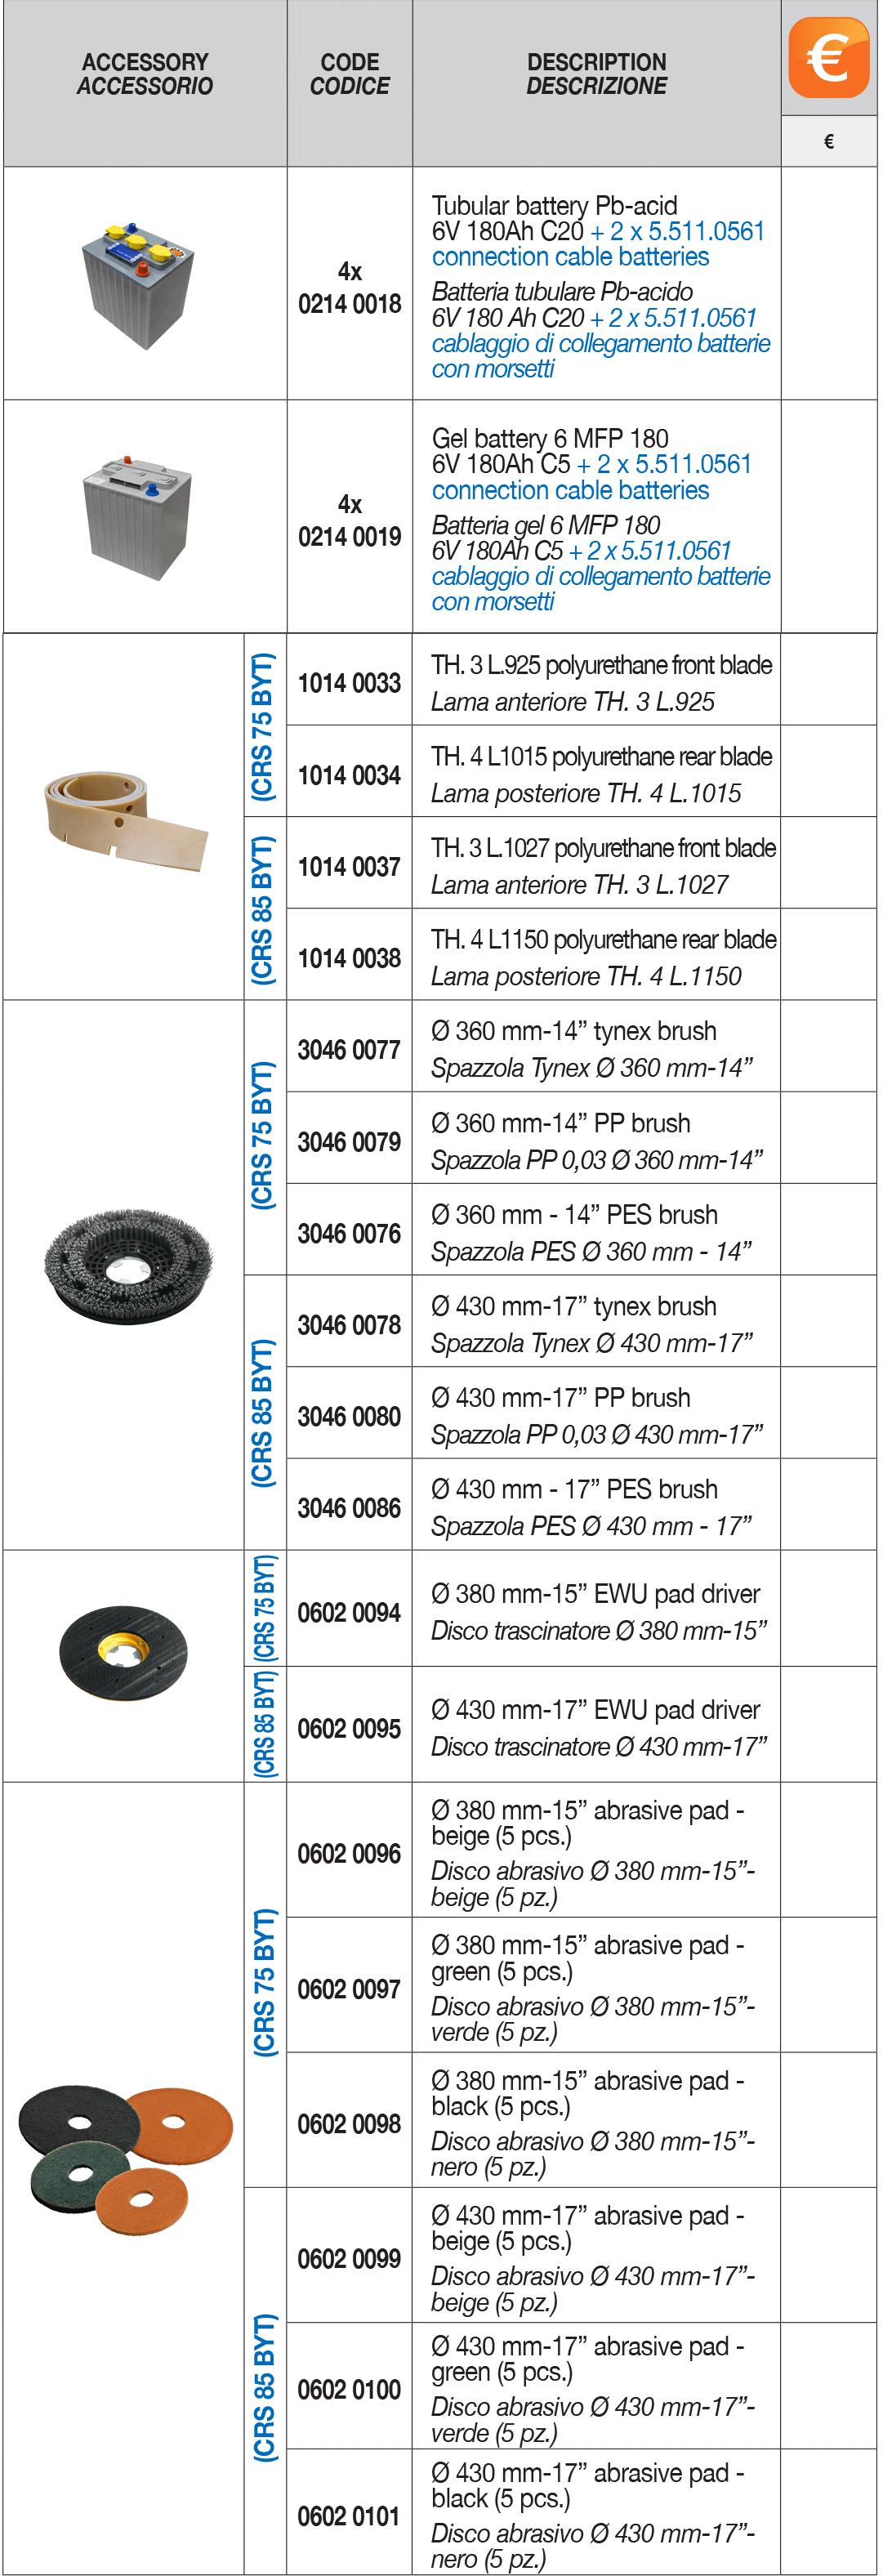 crs 75 85 byt optional accessories Comet